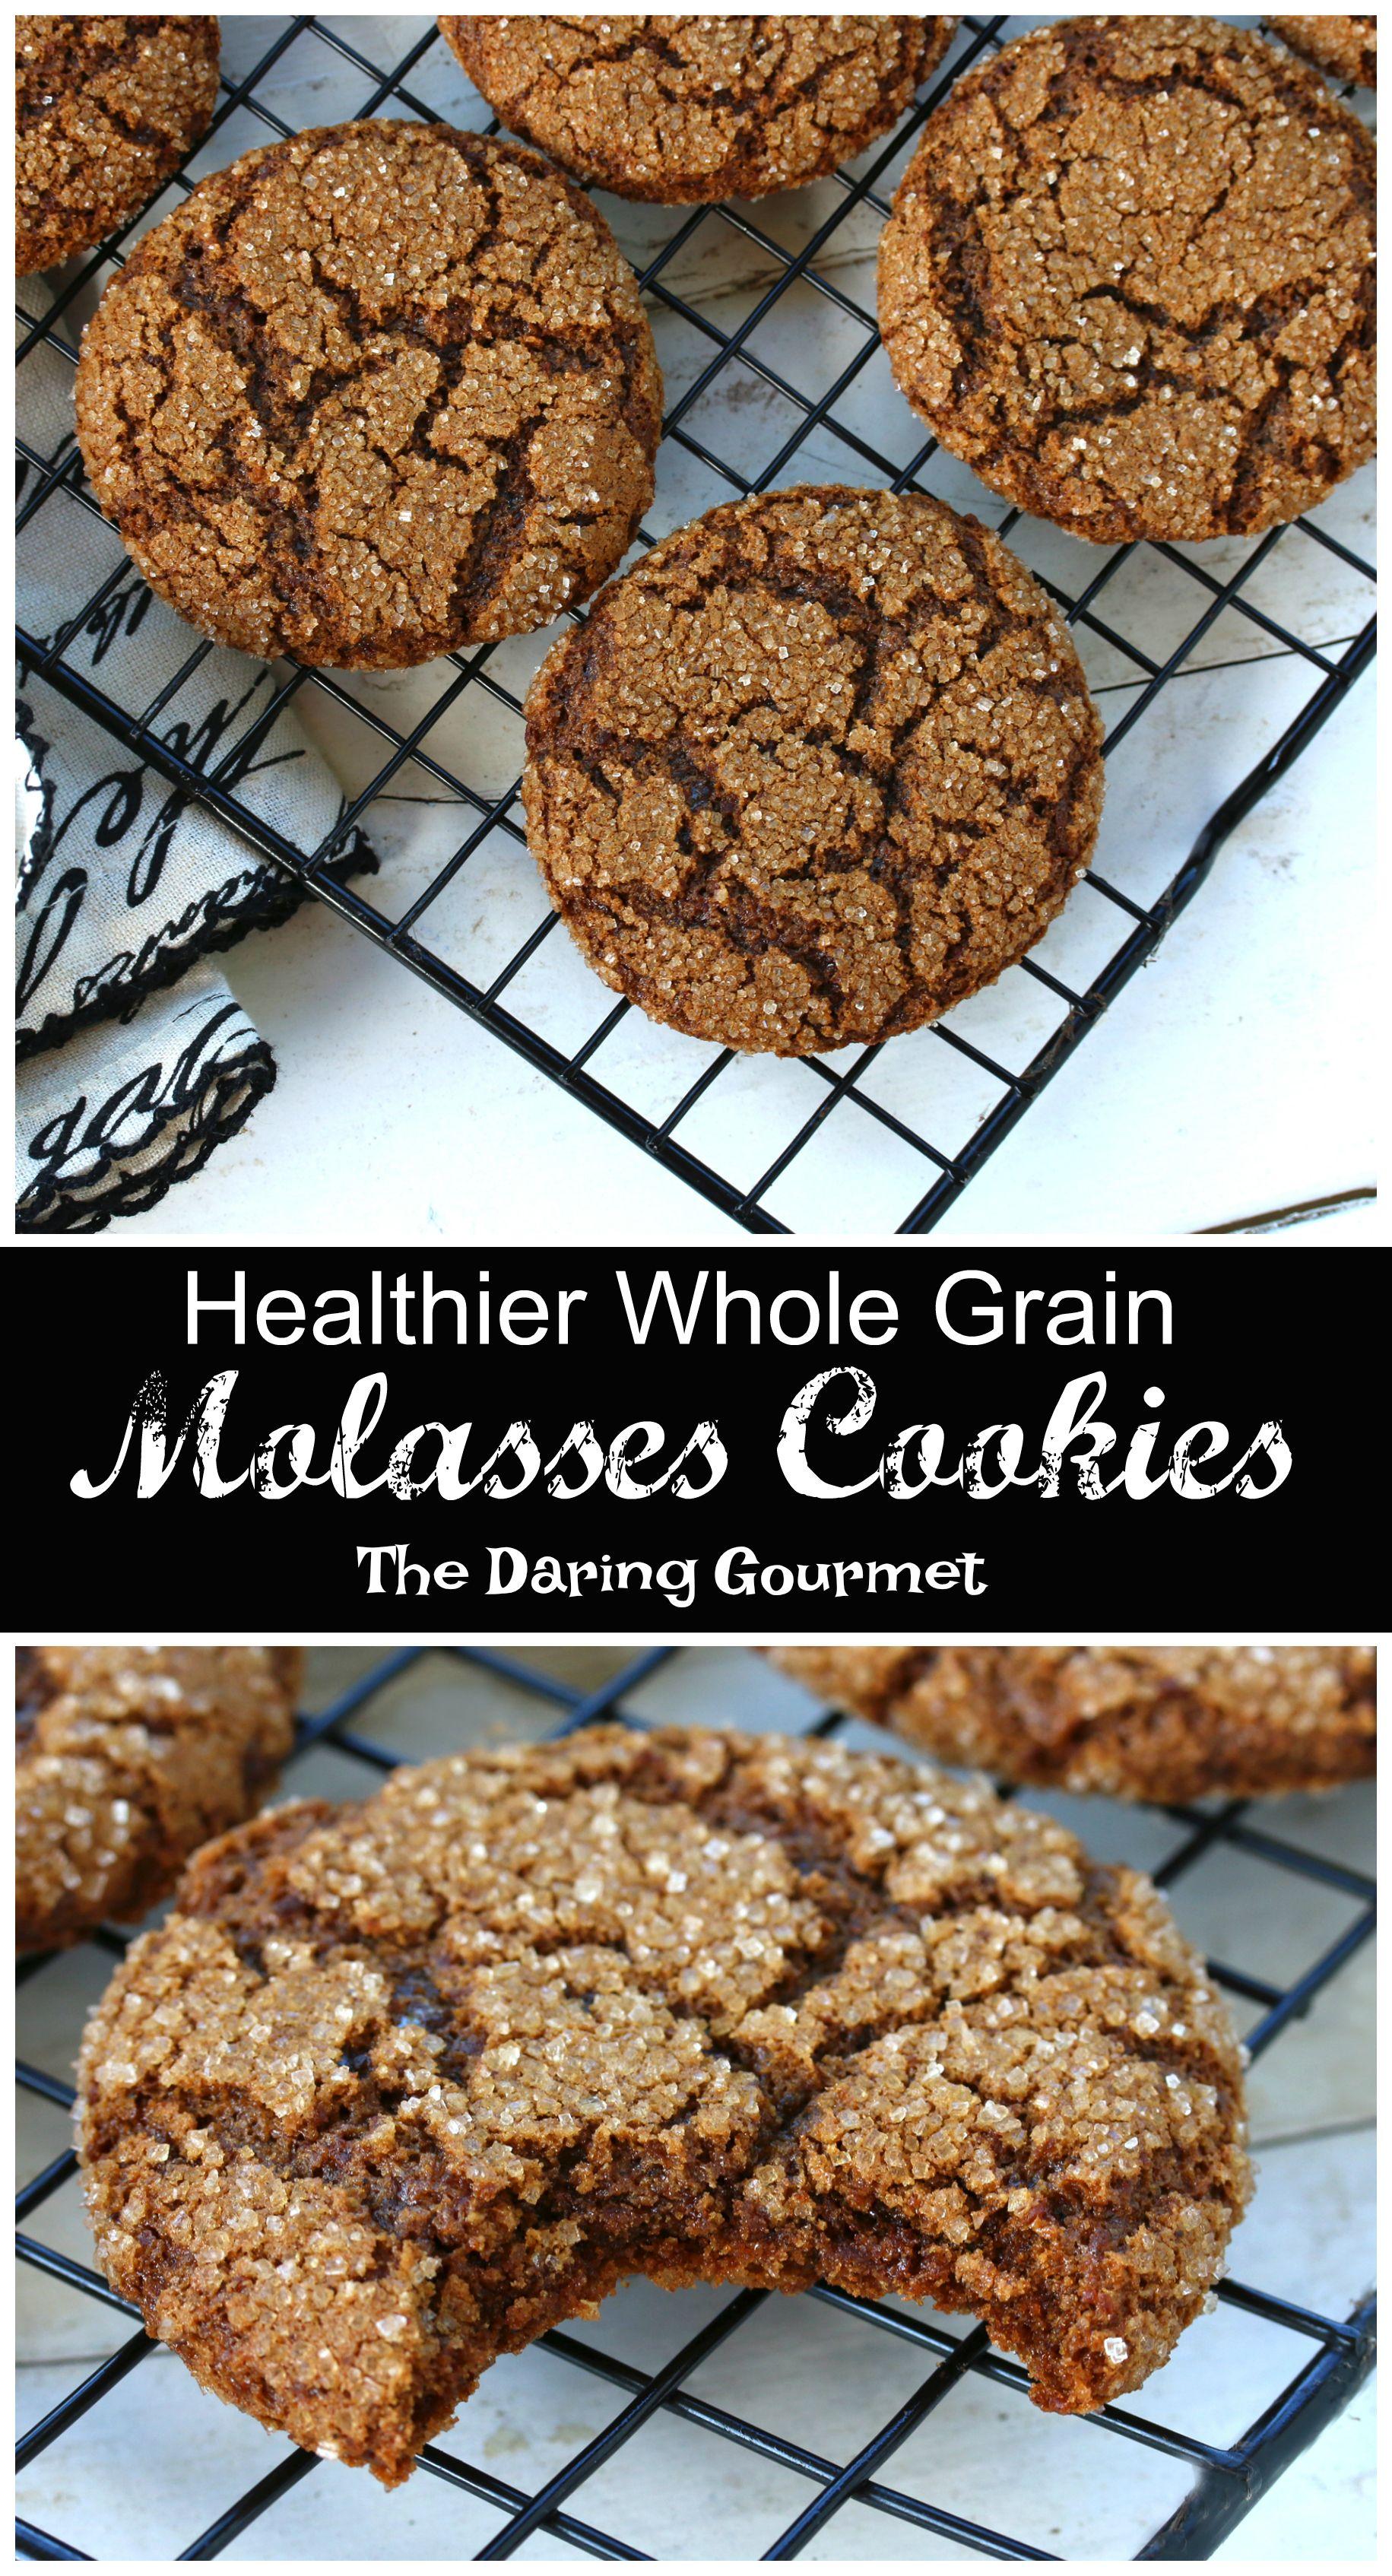 Healthier Whole Grain Molasses Cookies Recipe The Daring Gourmet